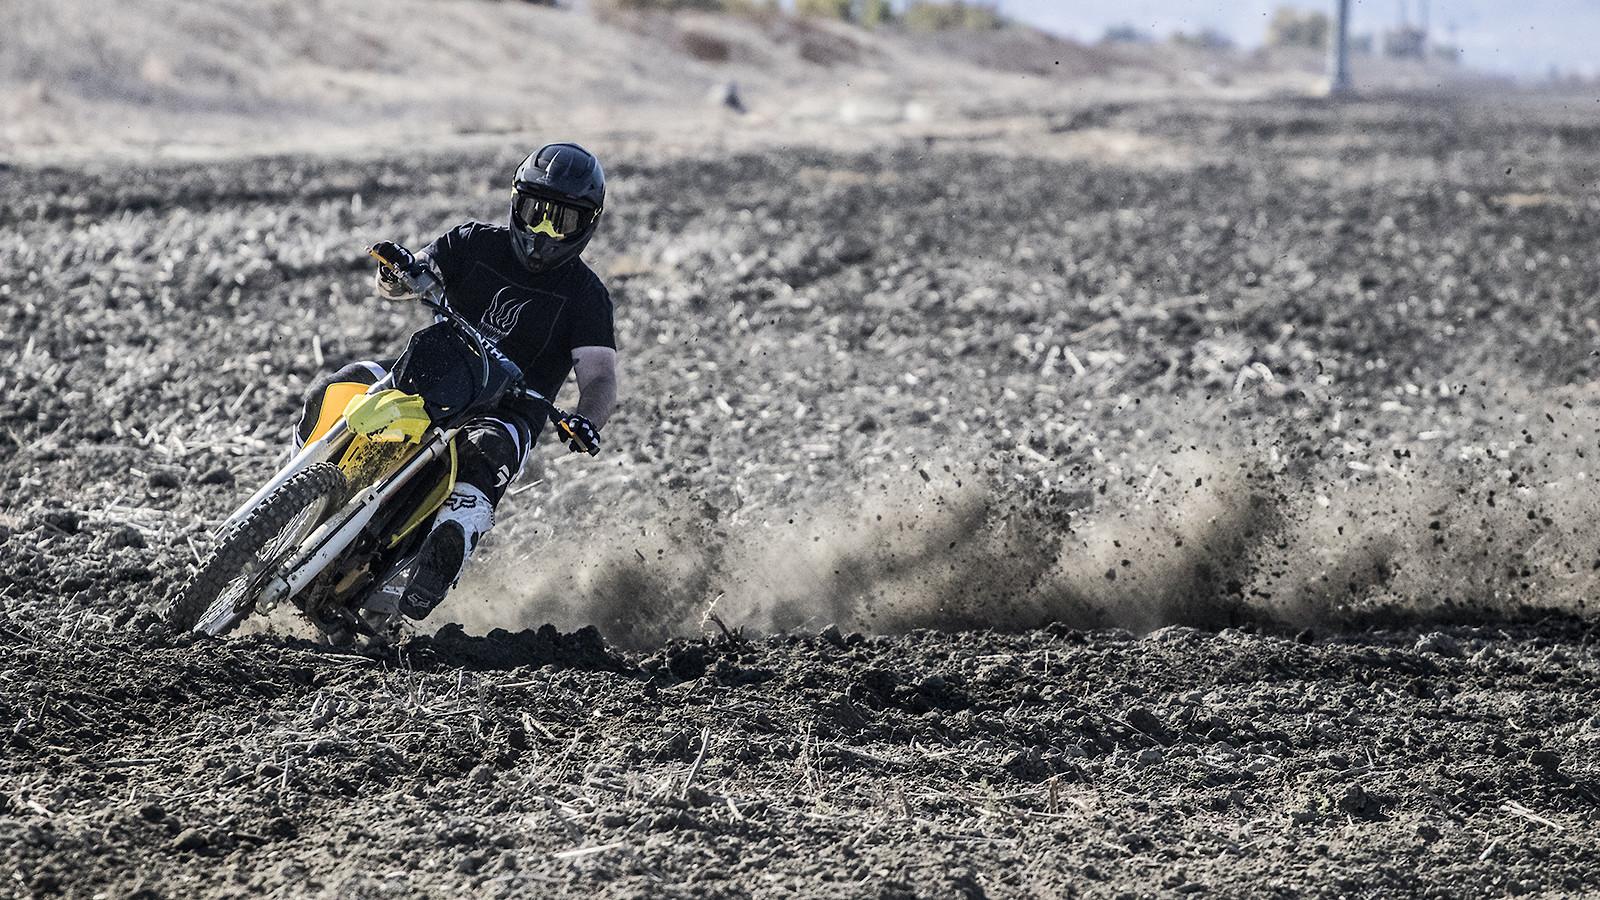 10 copy - JWRM - Motocross Pictures - Vital MX